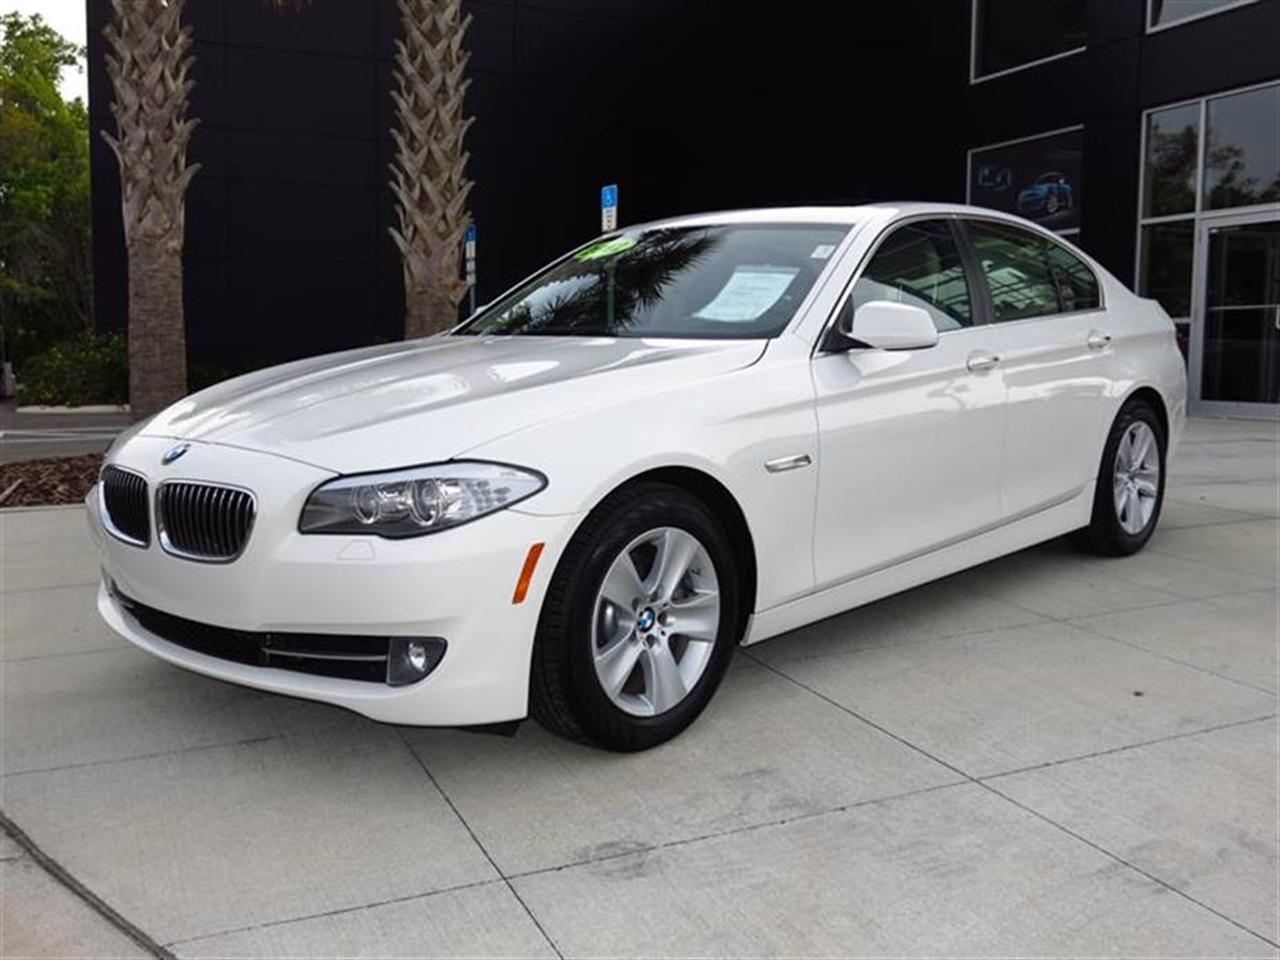 2012 BMW 5 SERIES 4dr Sdn 528i RWD 24957 miles 10-way power-adjustable front bucket seats -inc 4-